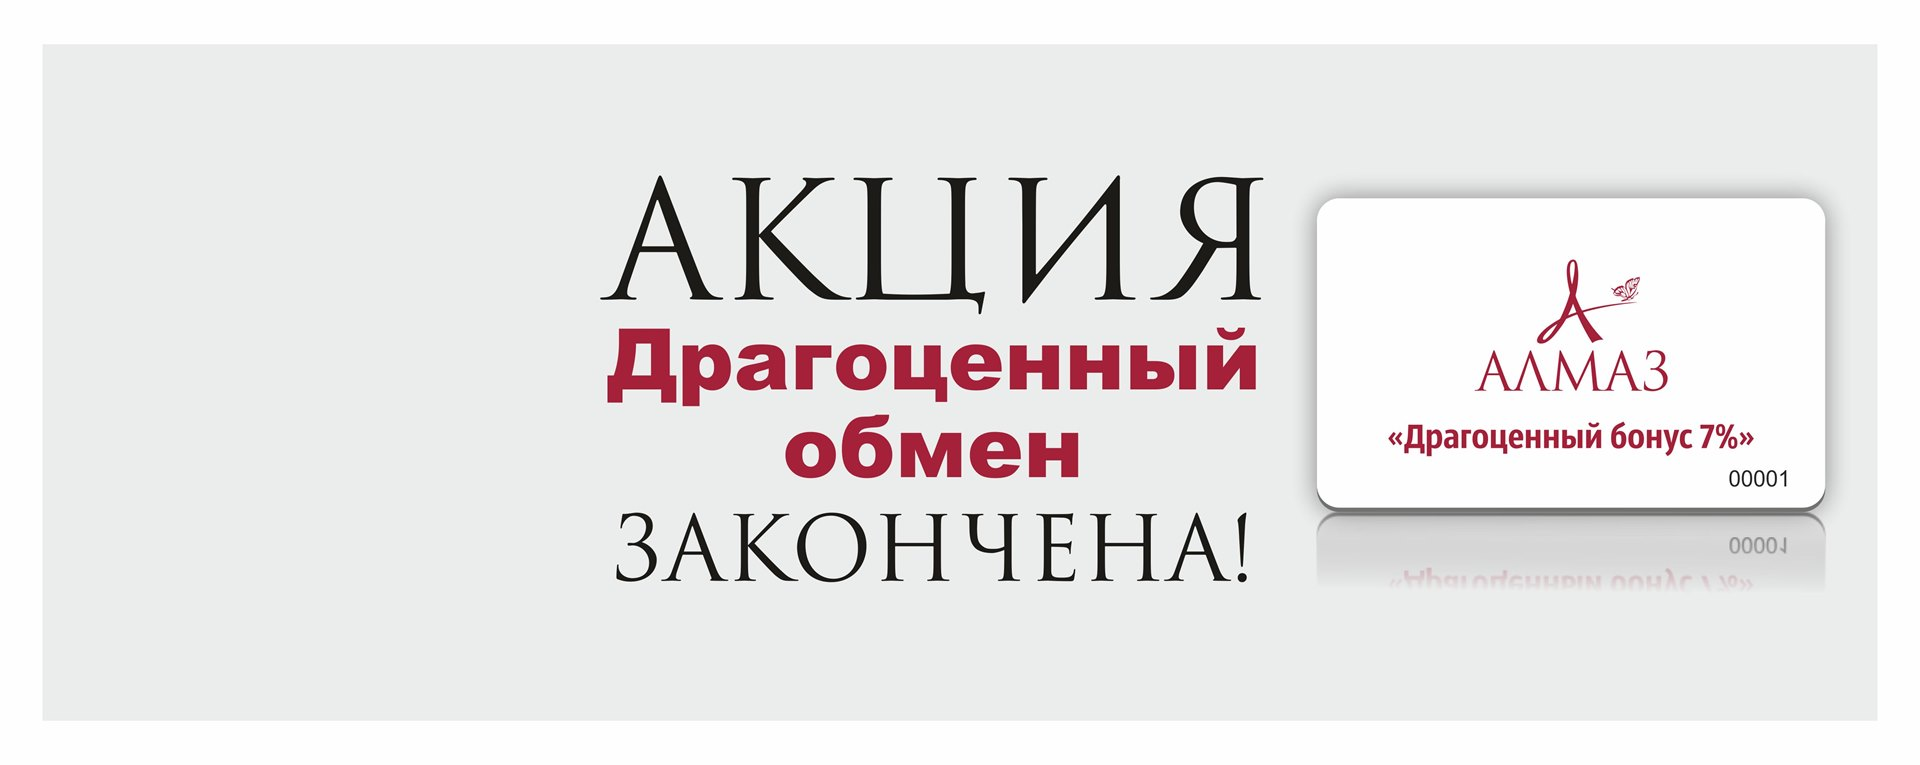 https://www.almazcom.ru/pub/img/Info/24/banner_almaz1.jpg